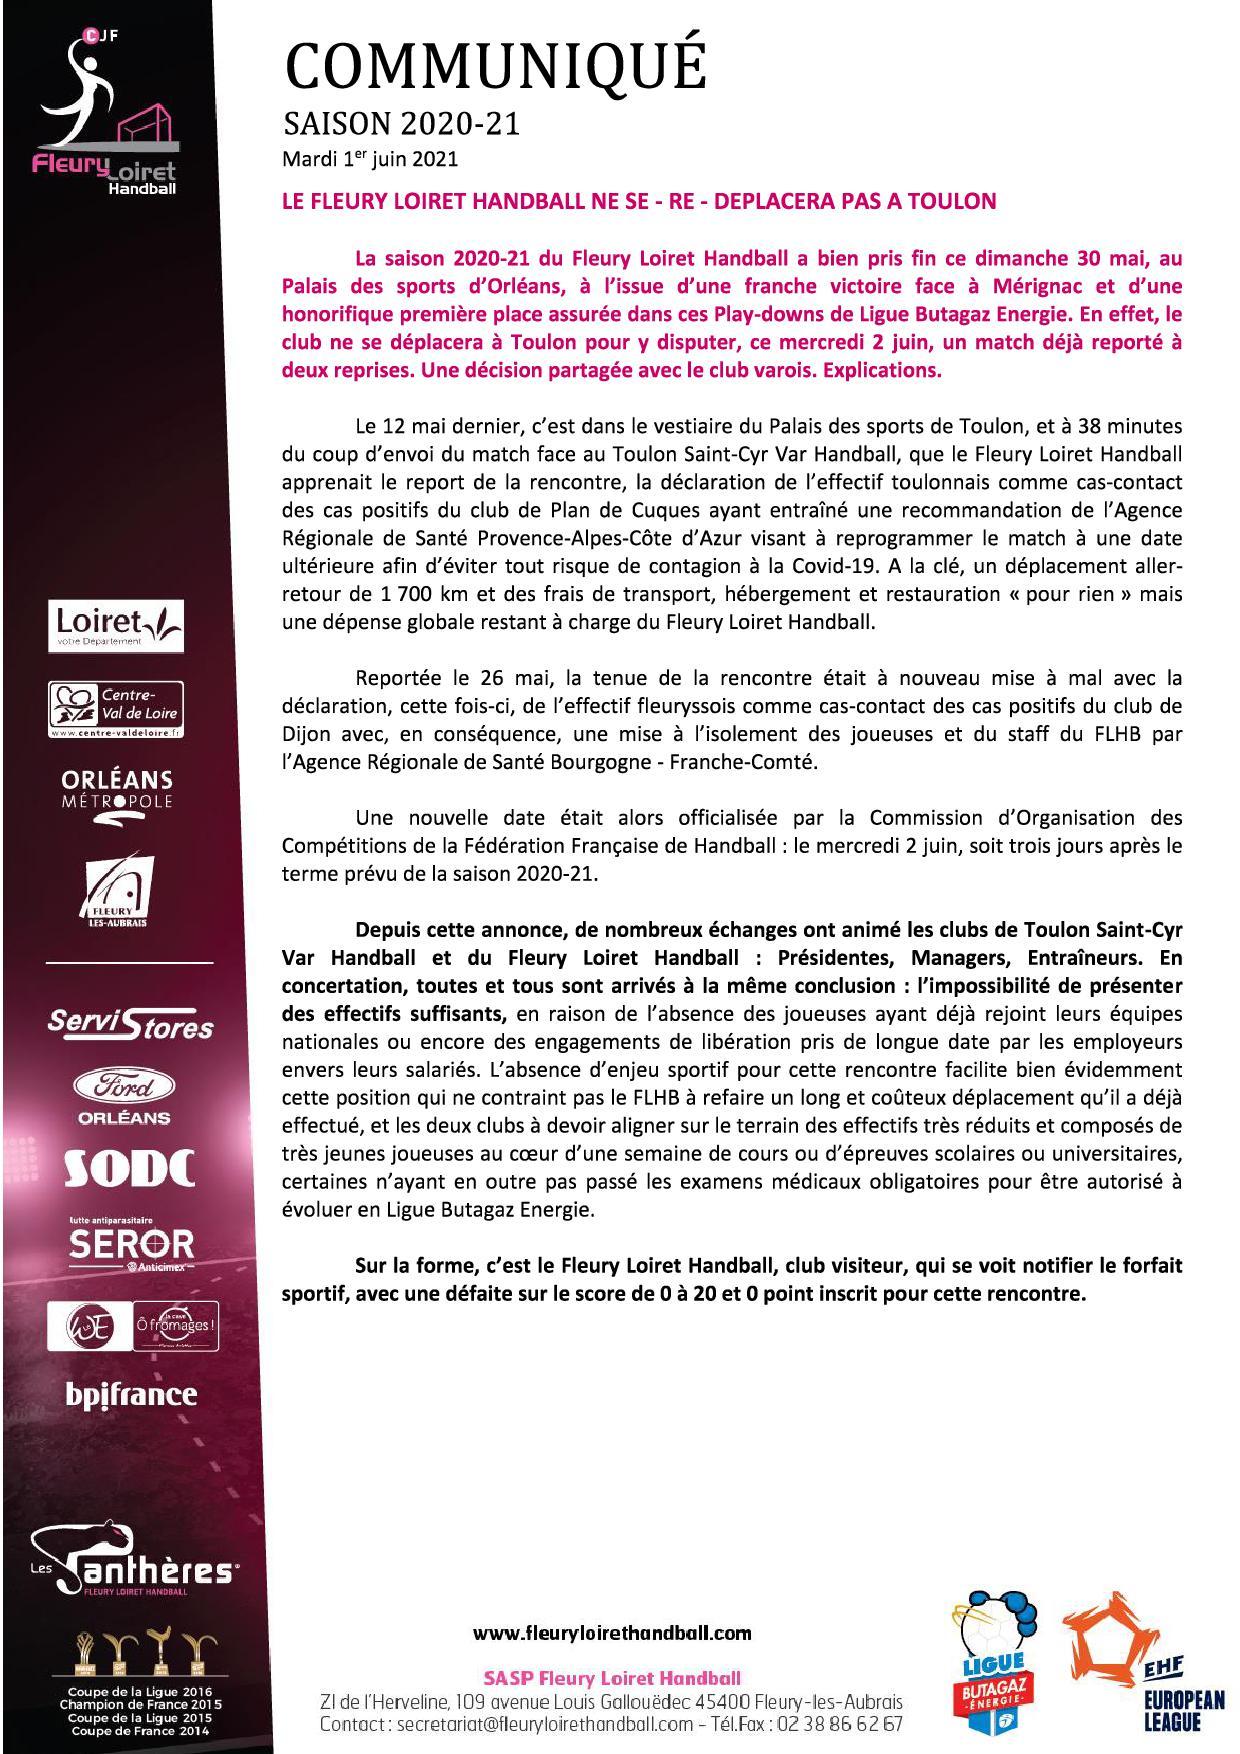 Communiqué Fleury Loiret Handball - Mardi 1er juin 2021.jpg